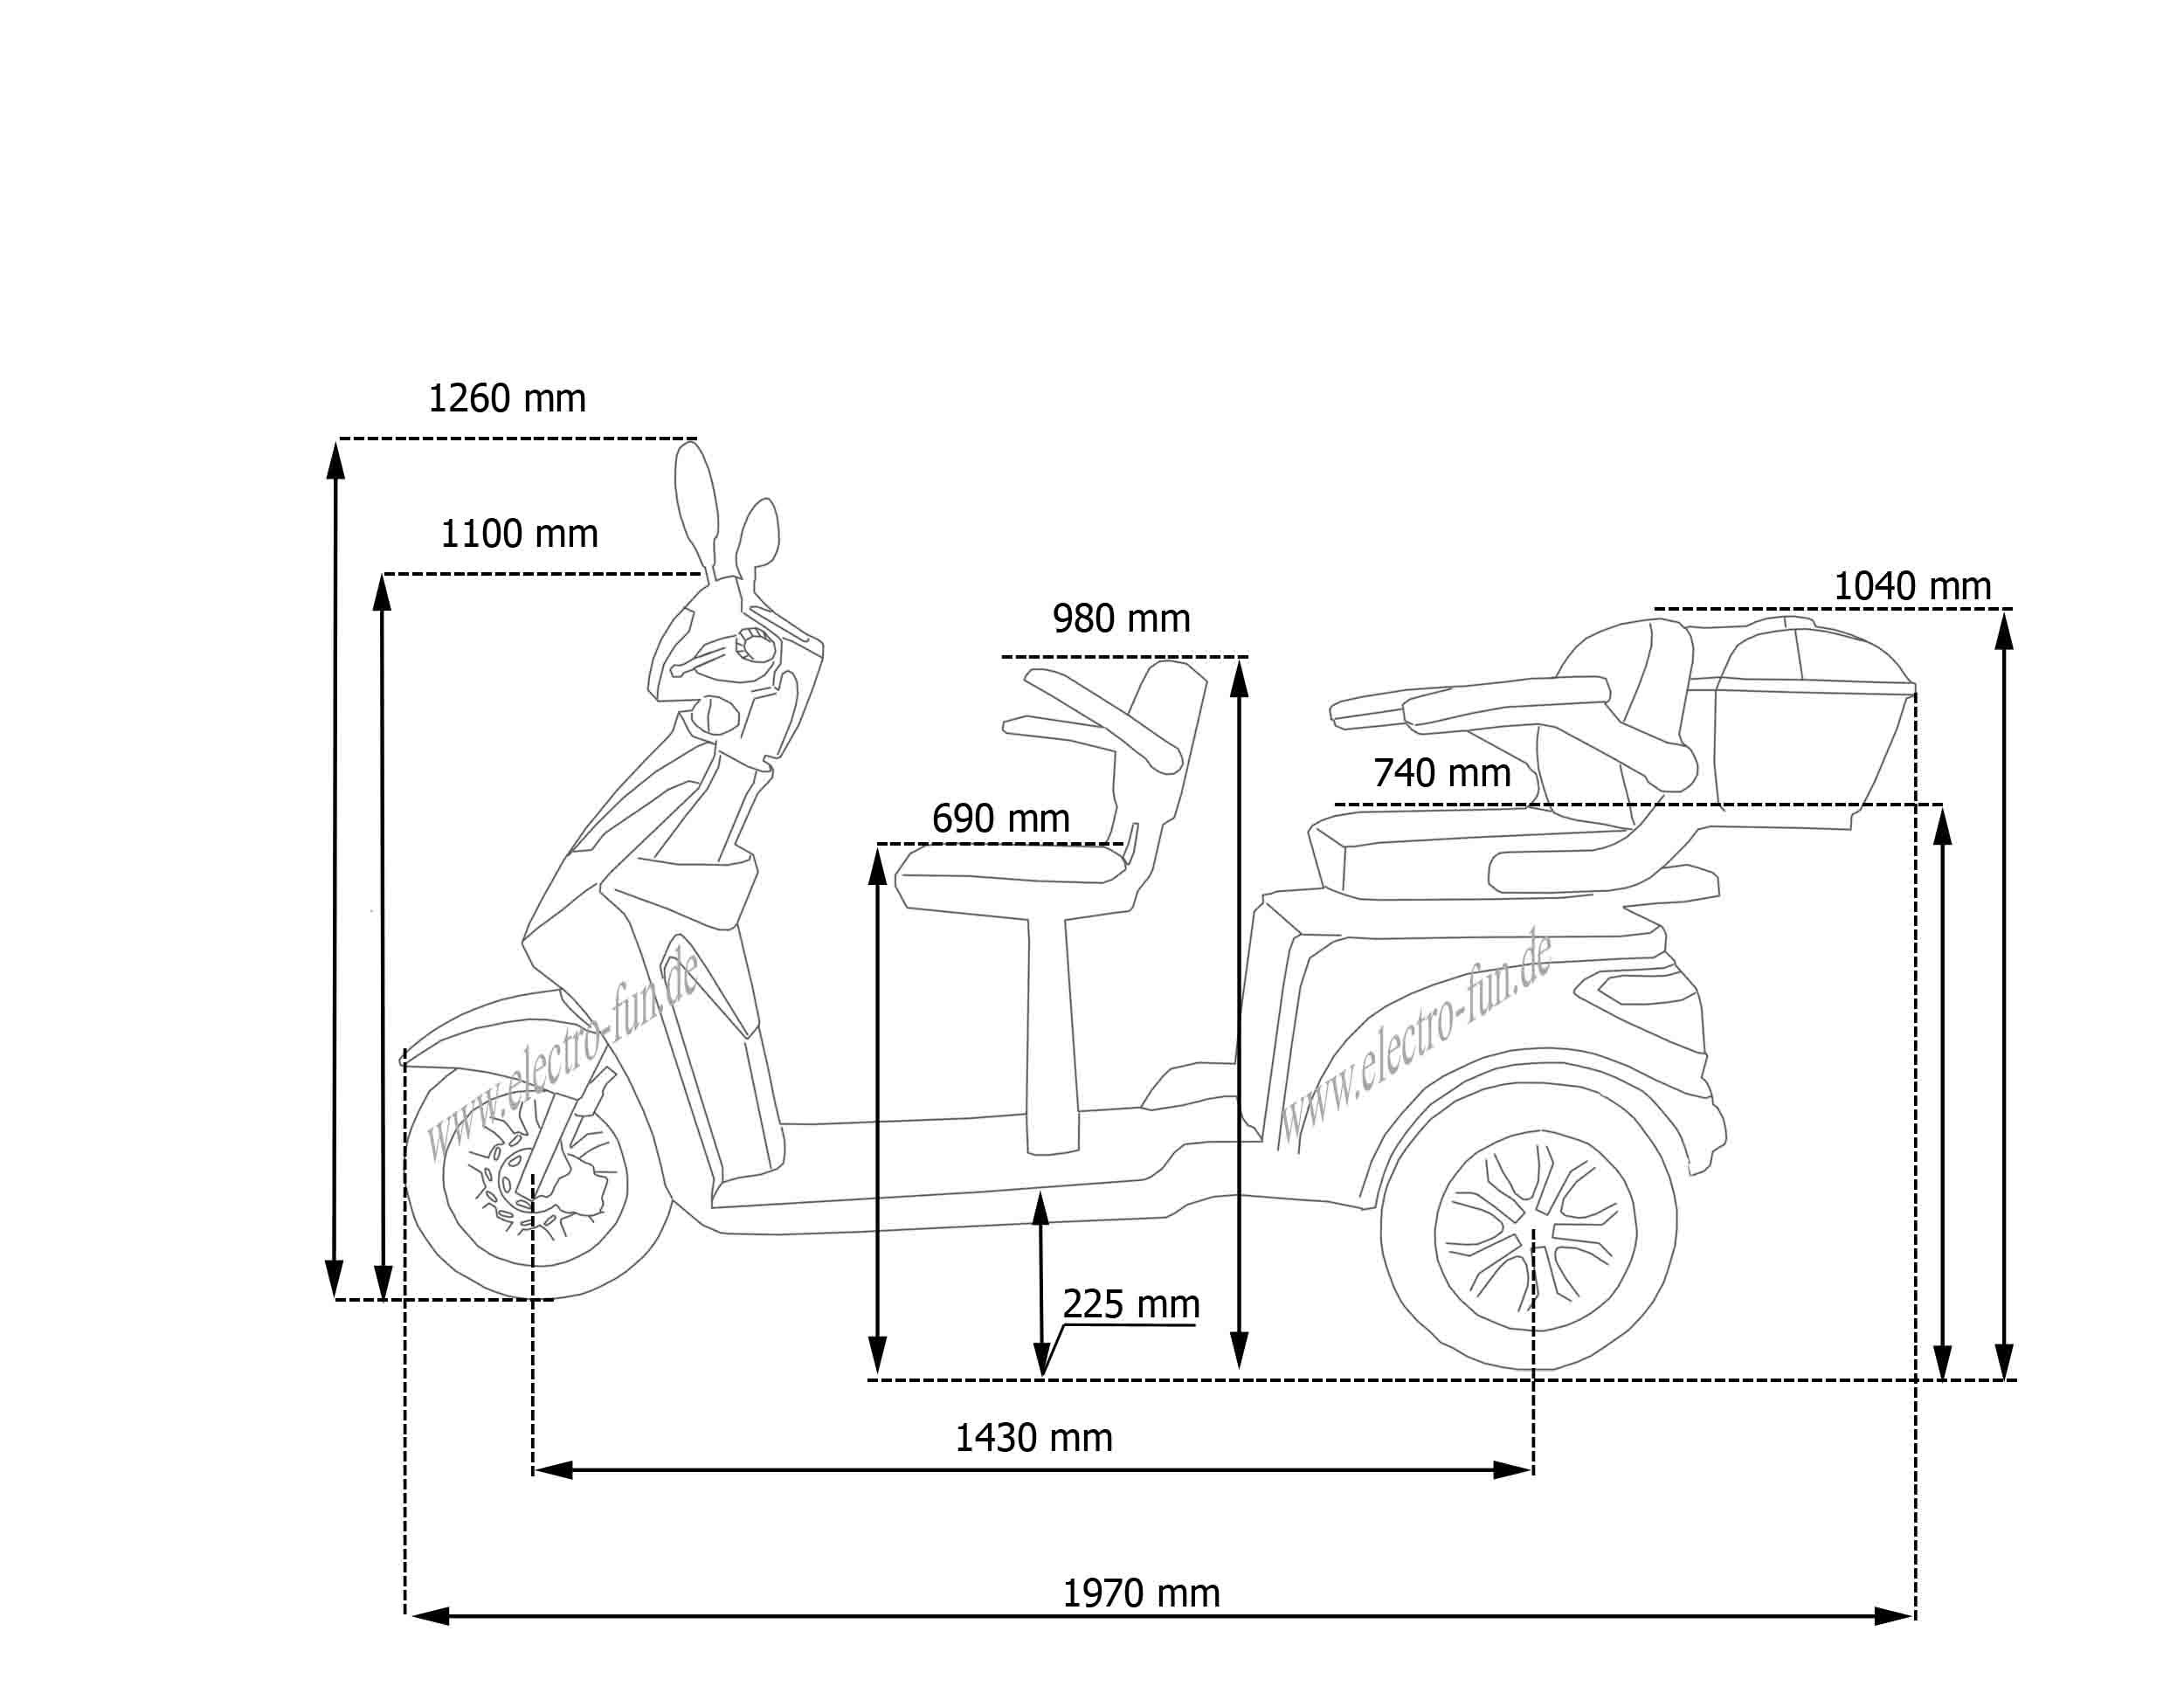 Abmessungen e scooter doppelsitzer ECO ENGEL 503 SILBER MIT LI-IO AKKU, SENIORENMOBIL, 25 KM/H